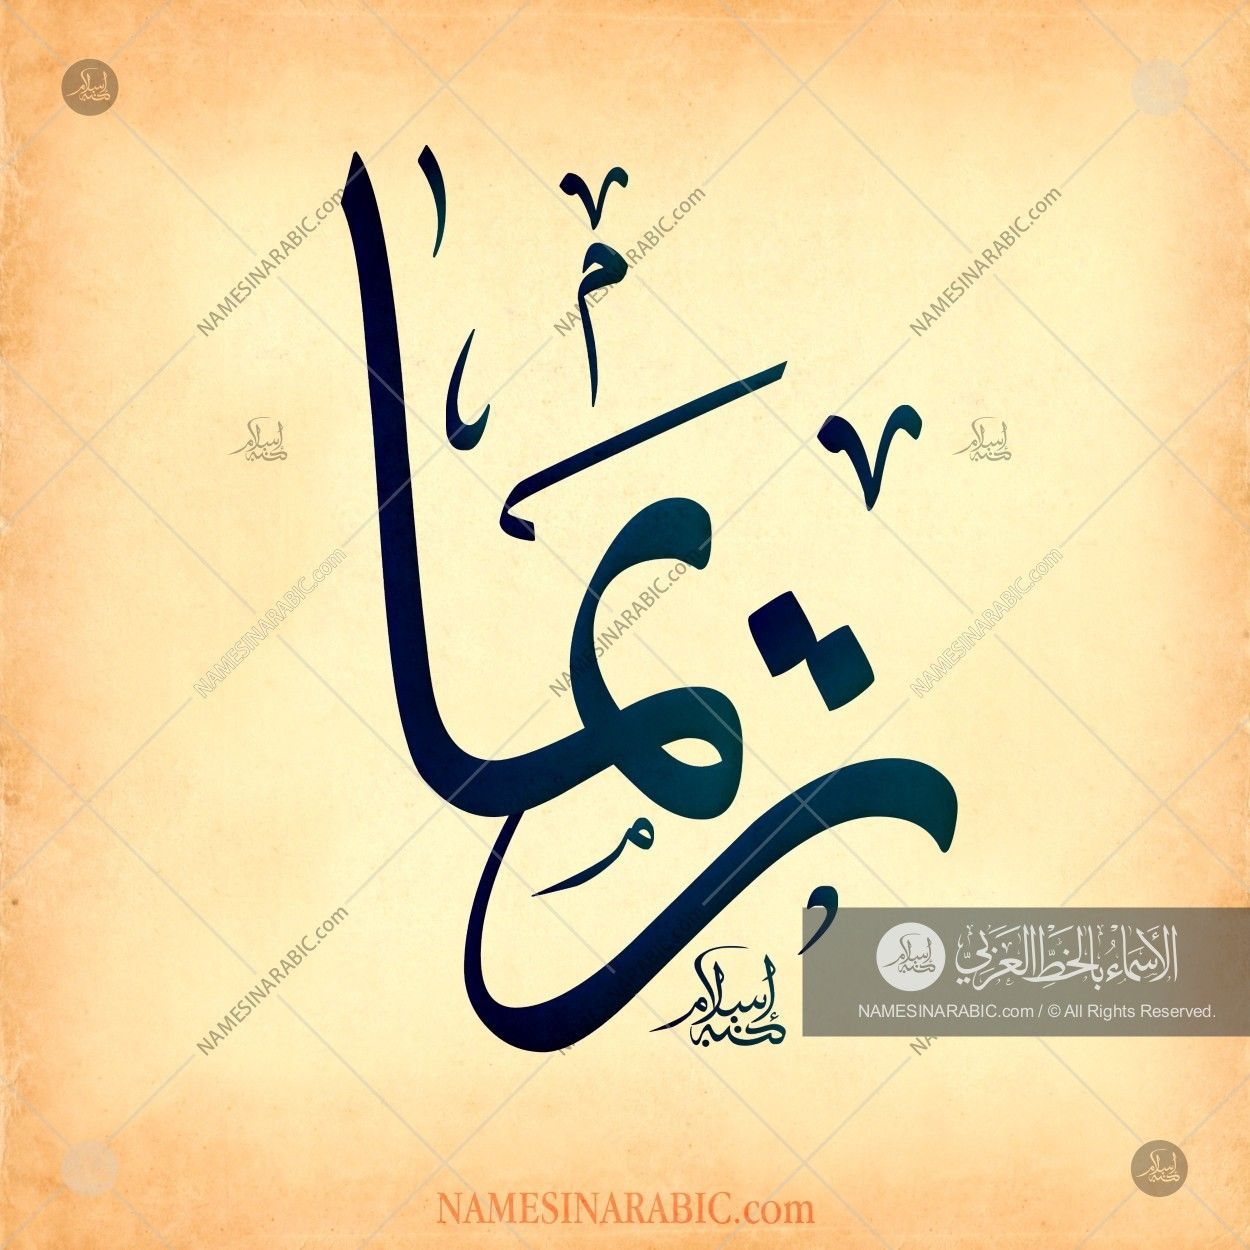 Reema Name In Arabic Calligraphy Calligraphy Calligraphy Name Mecca Wallpaper